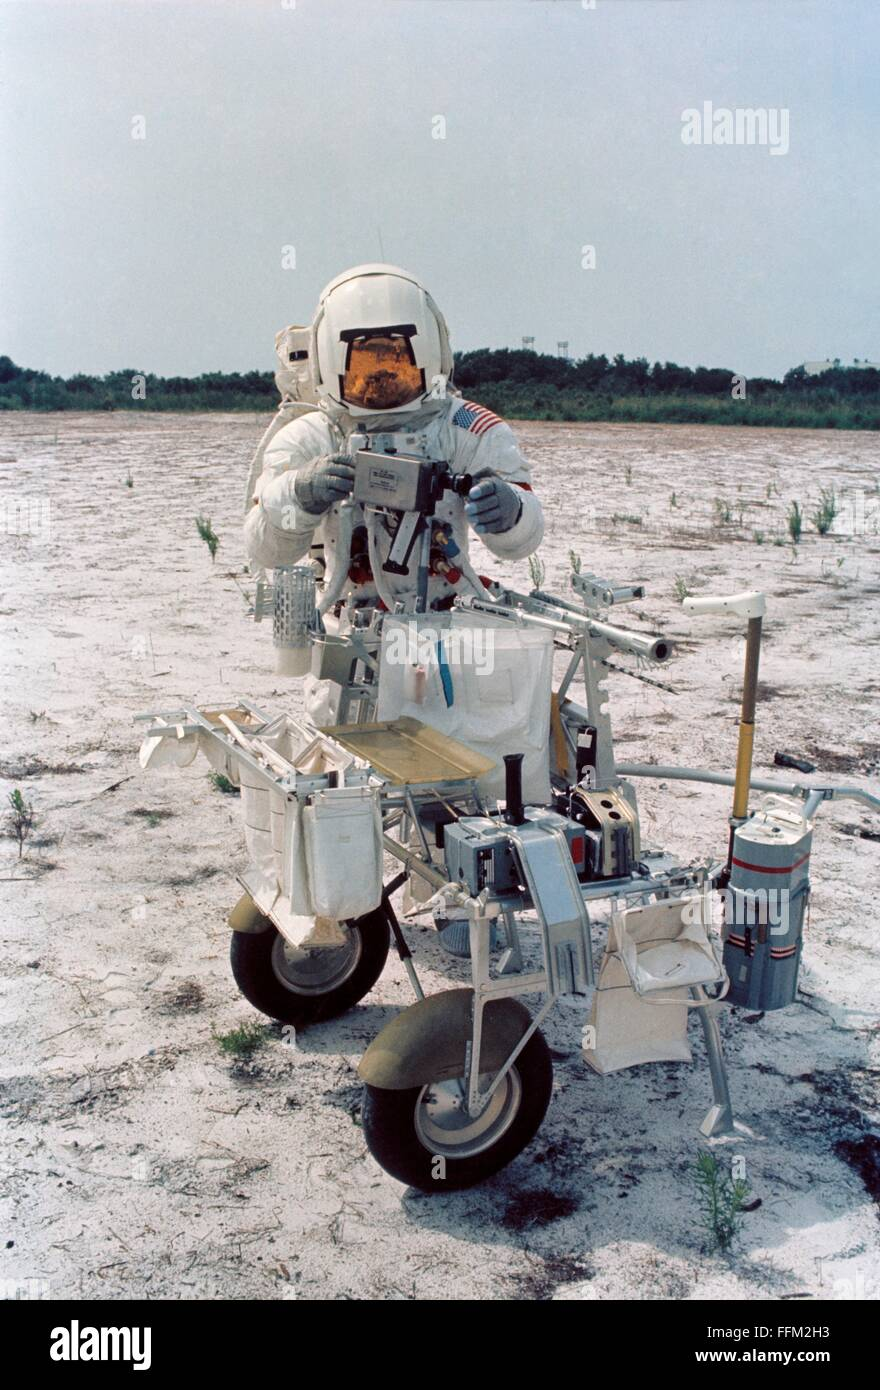 NASA Apollo 14 astronauts Alan B. Shepard Jr., commander, during lunar surface simulation training at the Kennedy - Stock Image